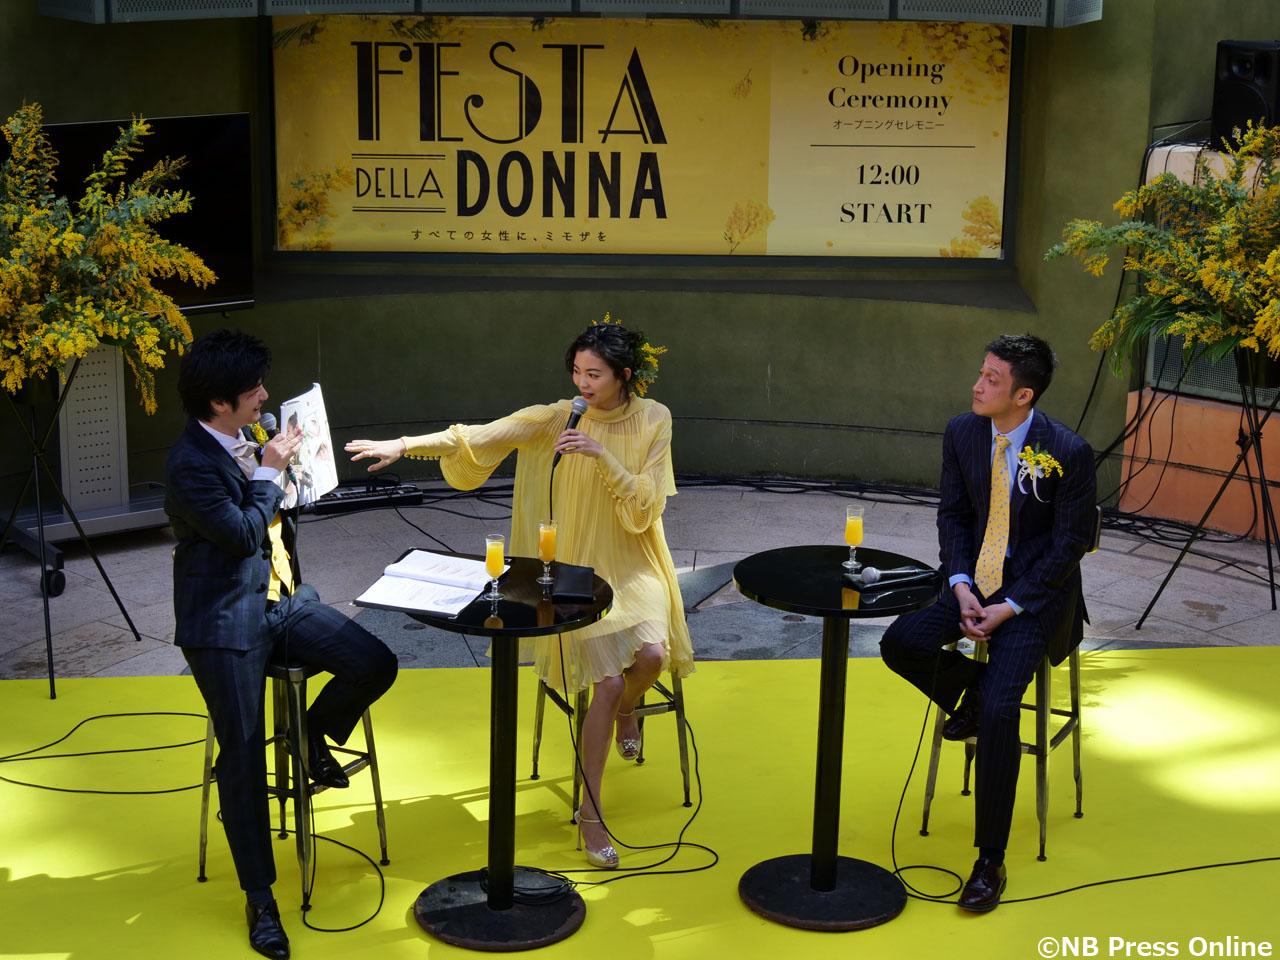 FESTA DELLA DONNA(フェスタ・デッラ・ドンナ)2018